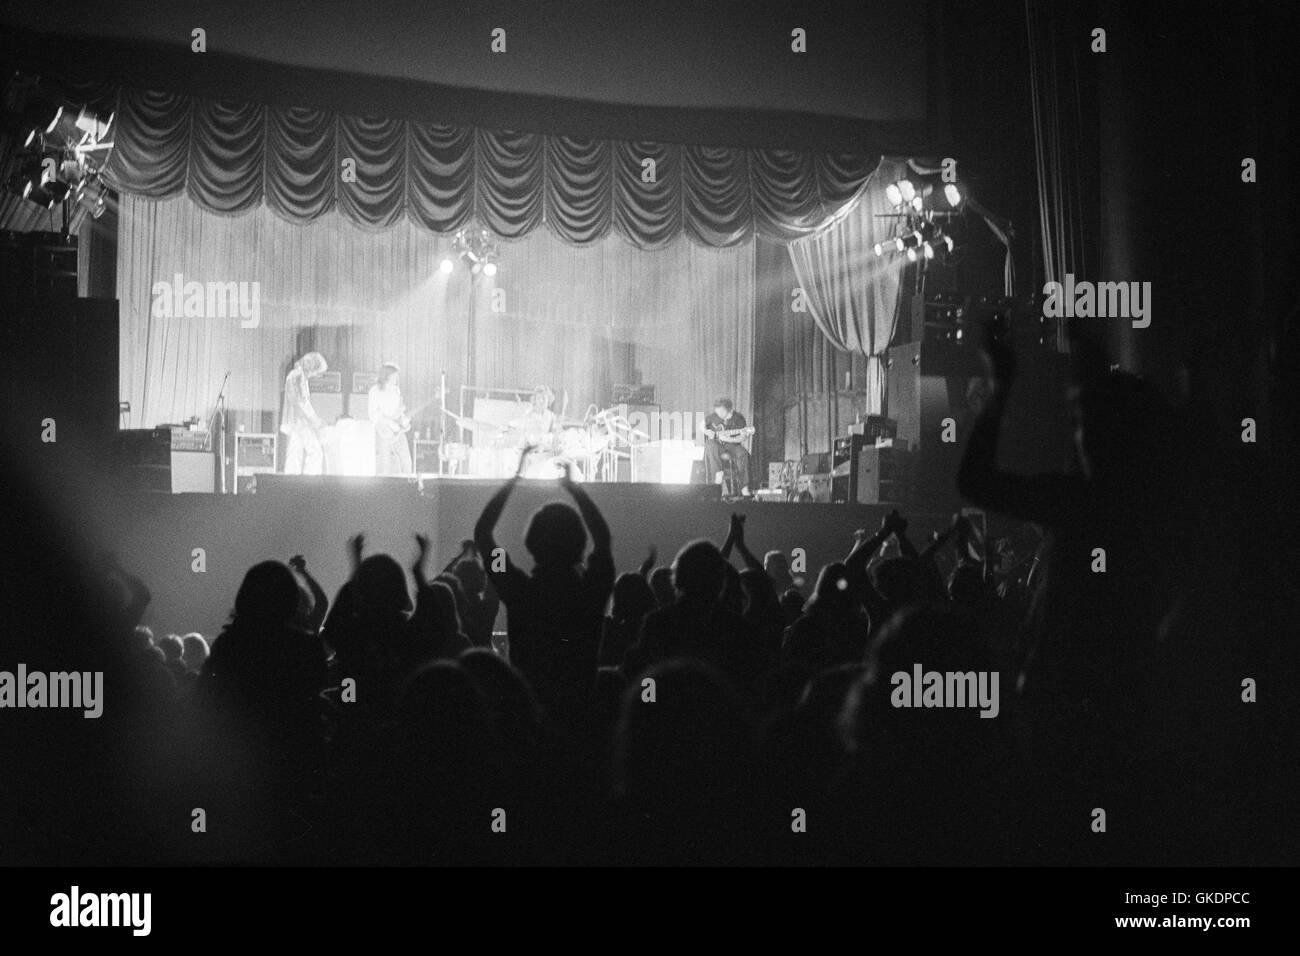 King Crimson on stage at Greens Playhouse  (the Apollo Theatre) Glasgow, 1971 - Stock Image